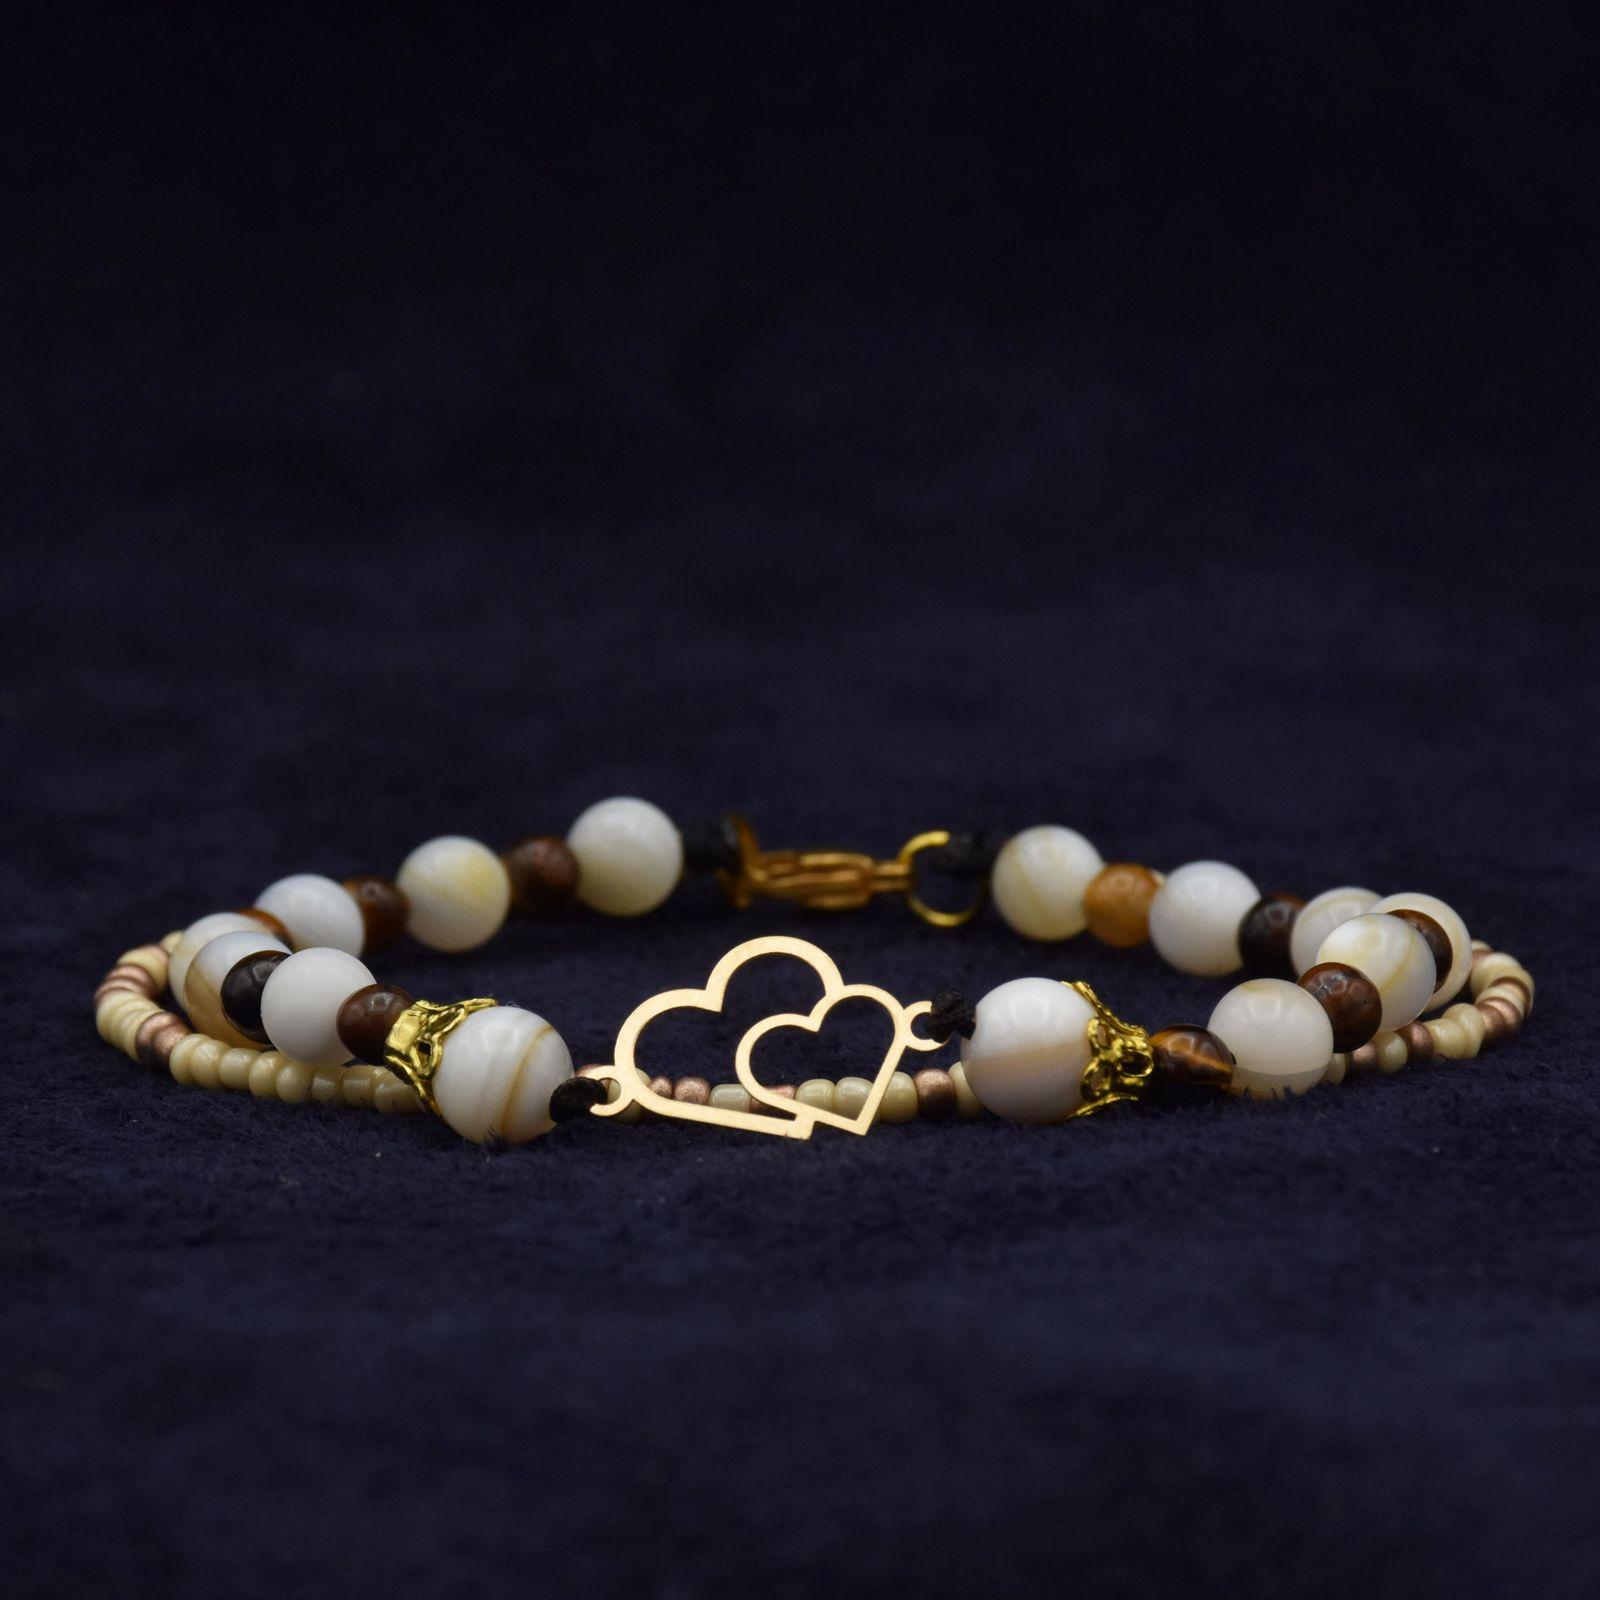 دستبند طلا 18 عیار زنانه آمانژ طرح قلب کد 972D8905 -  - 1